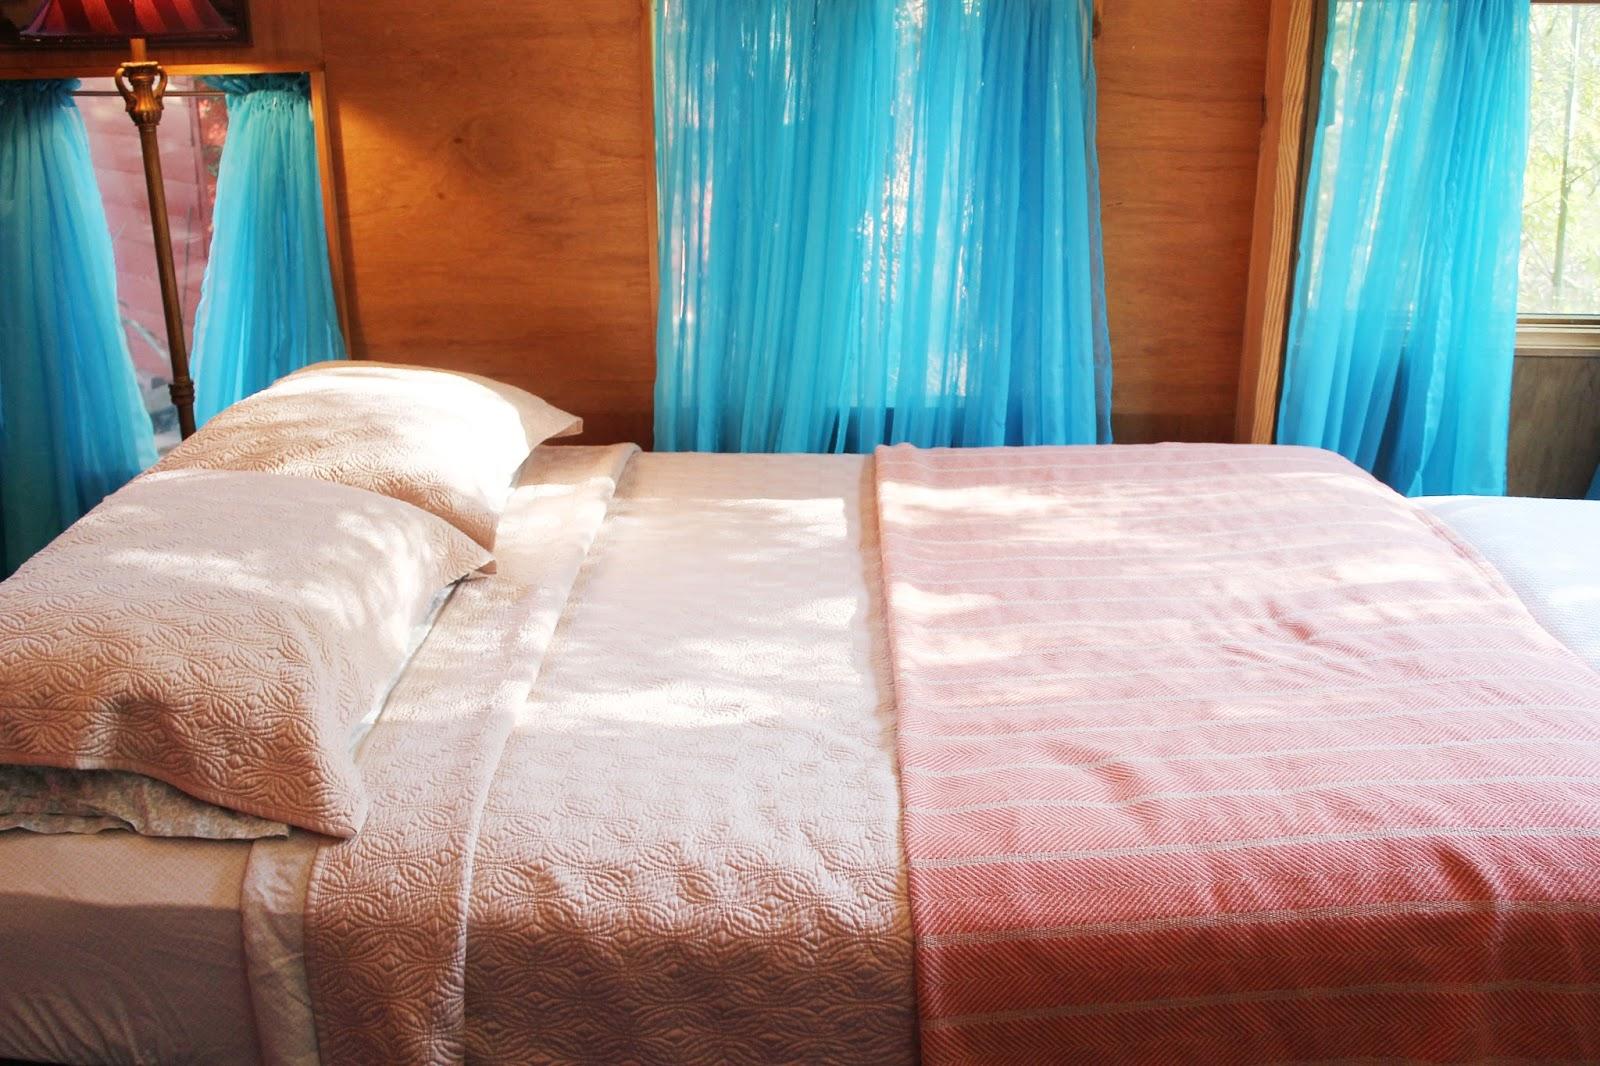 austin airbnb rental